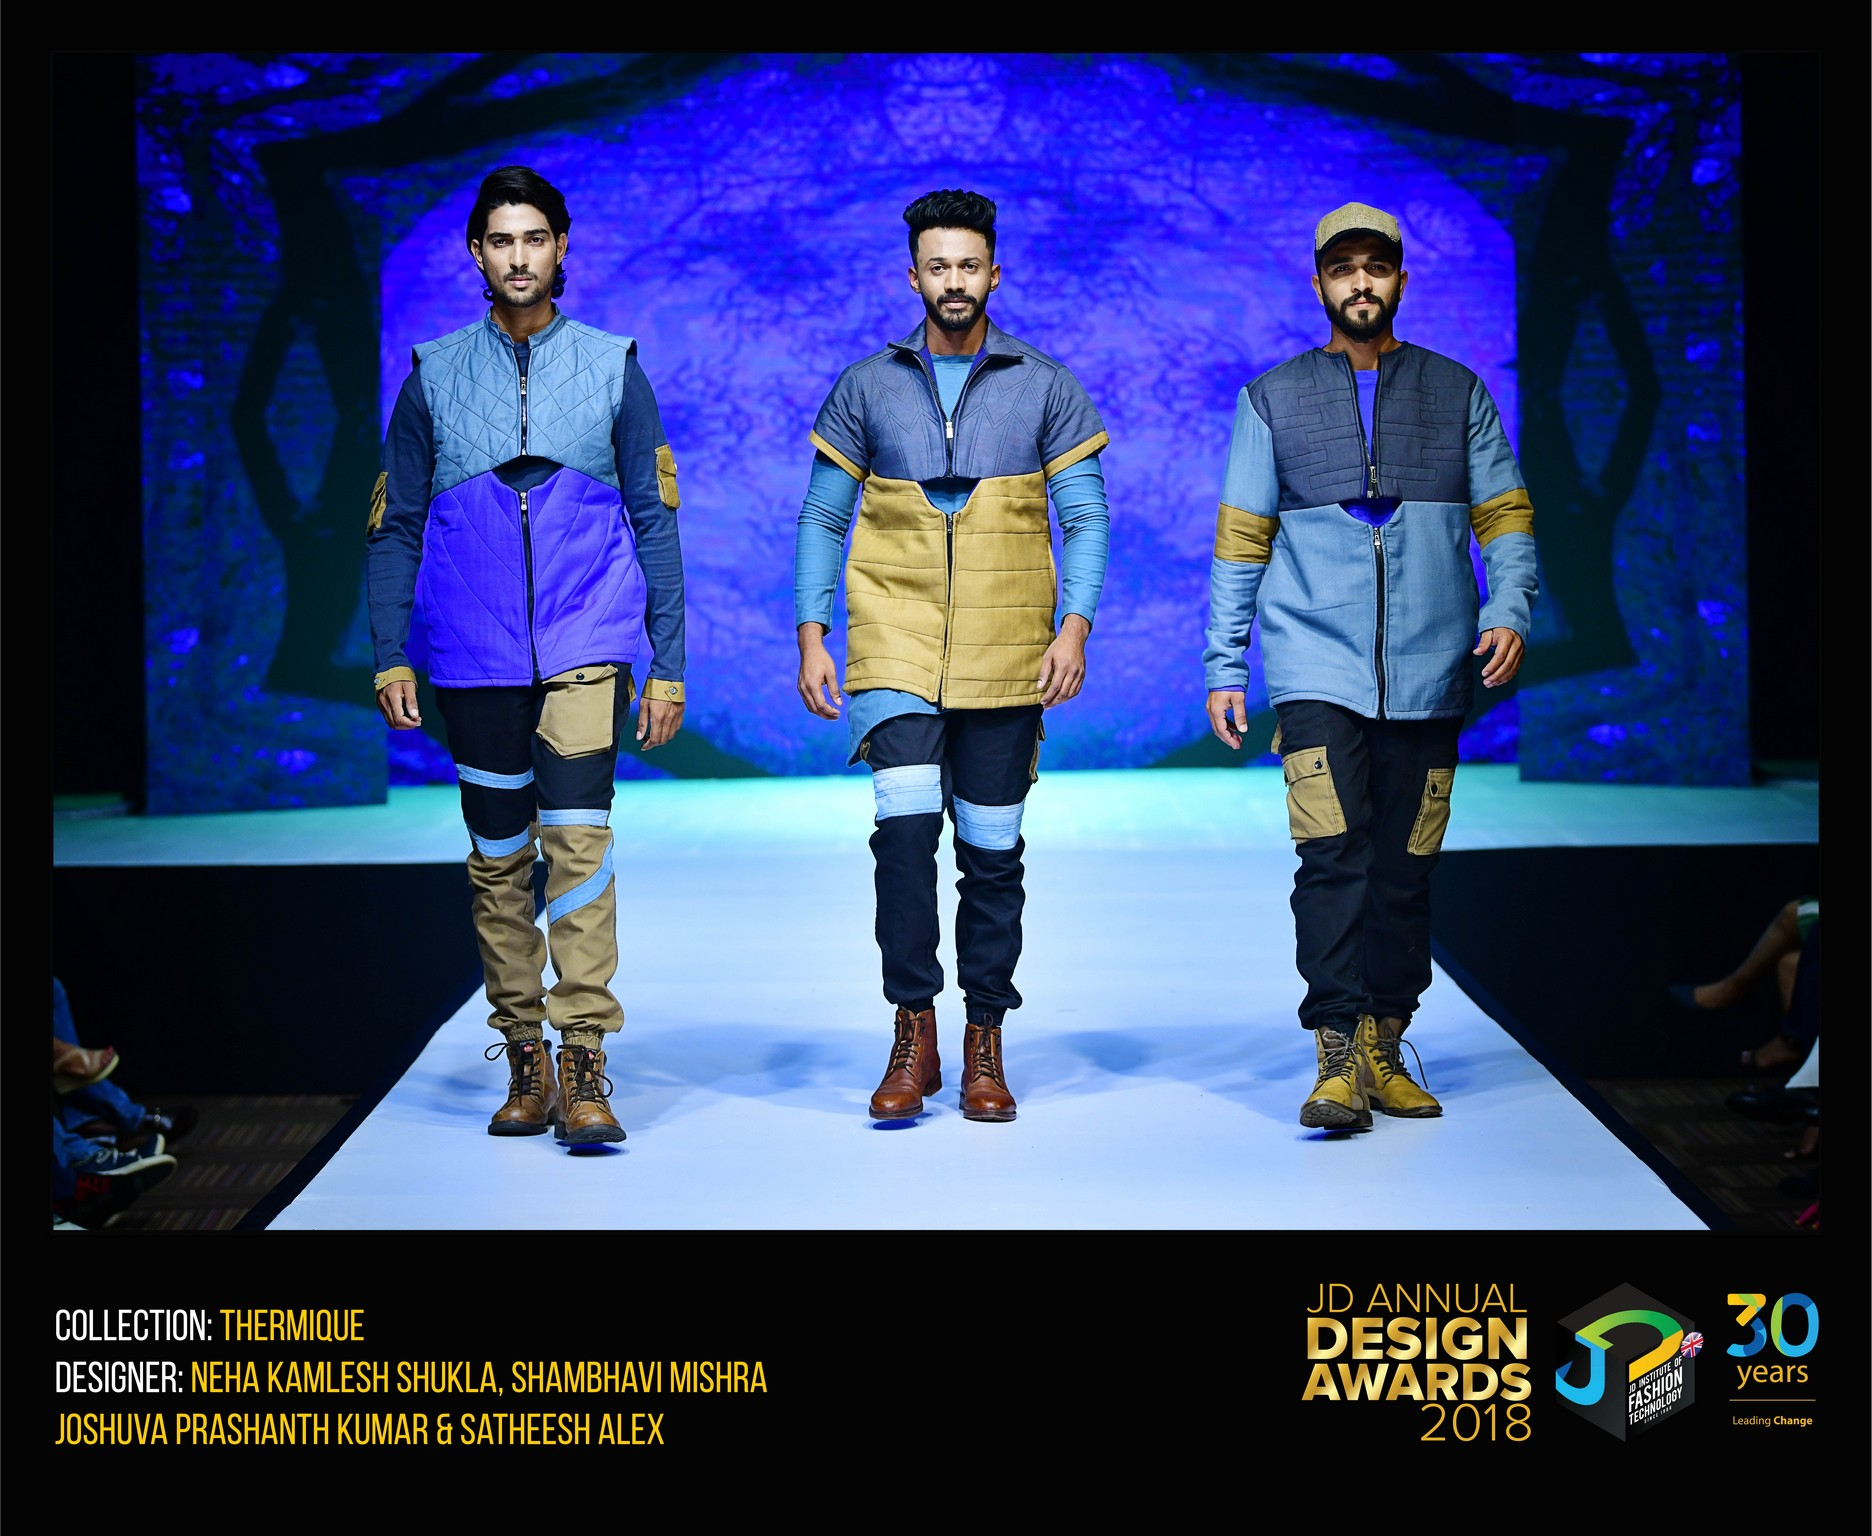 Thermique – Change – JD Annual Design Awards 2018   Designer: Shambhavi, Neha and satish   Photography : Jerin Nath (@jerin_nath) thermique - THERMIQUE 8 - Thermique – Change – JD Annual Design Awards 2018